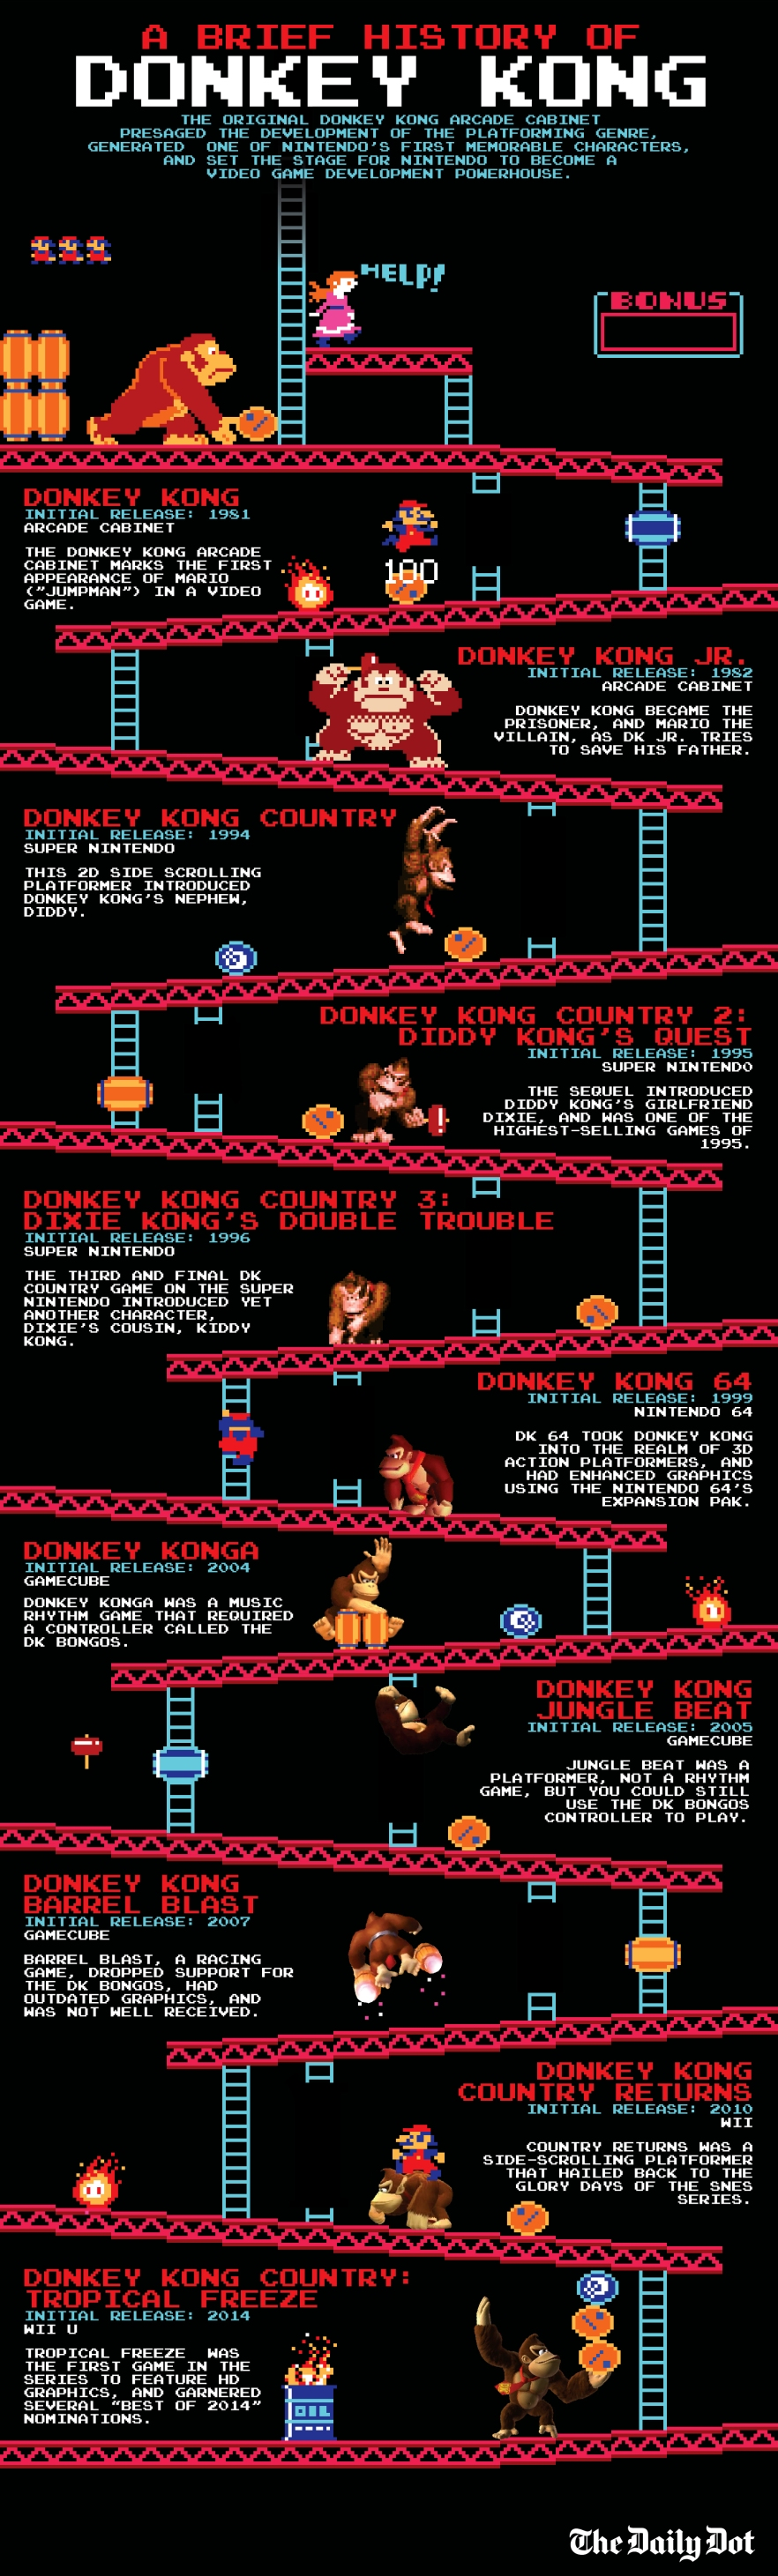 donkey_kong_fixed_infographic